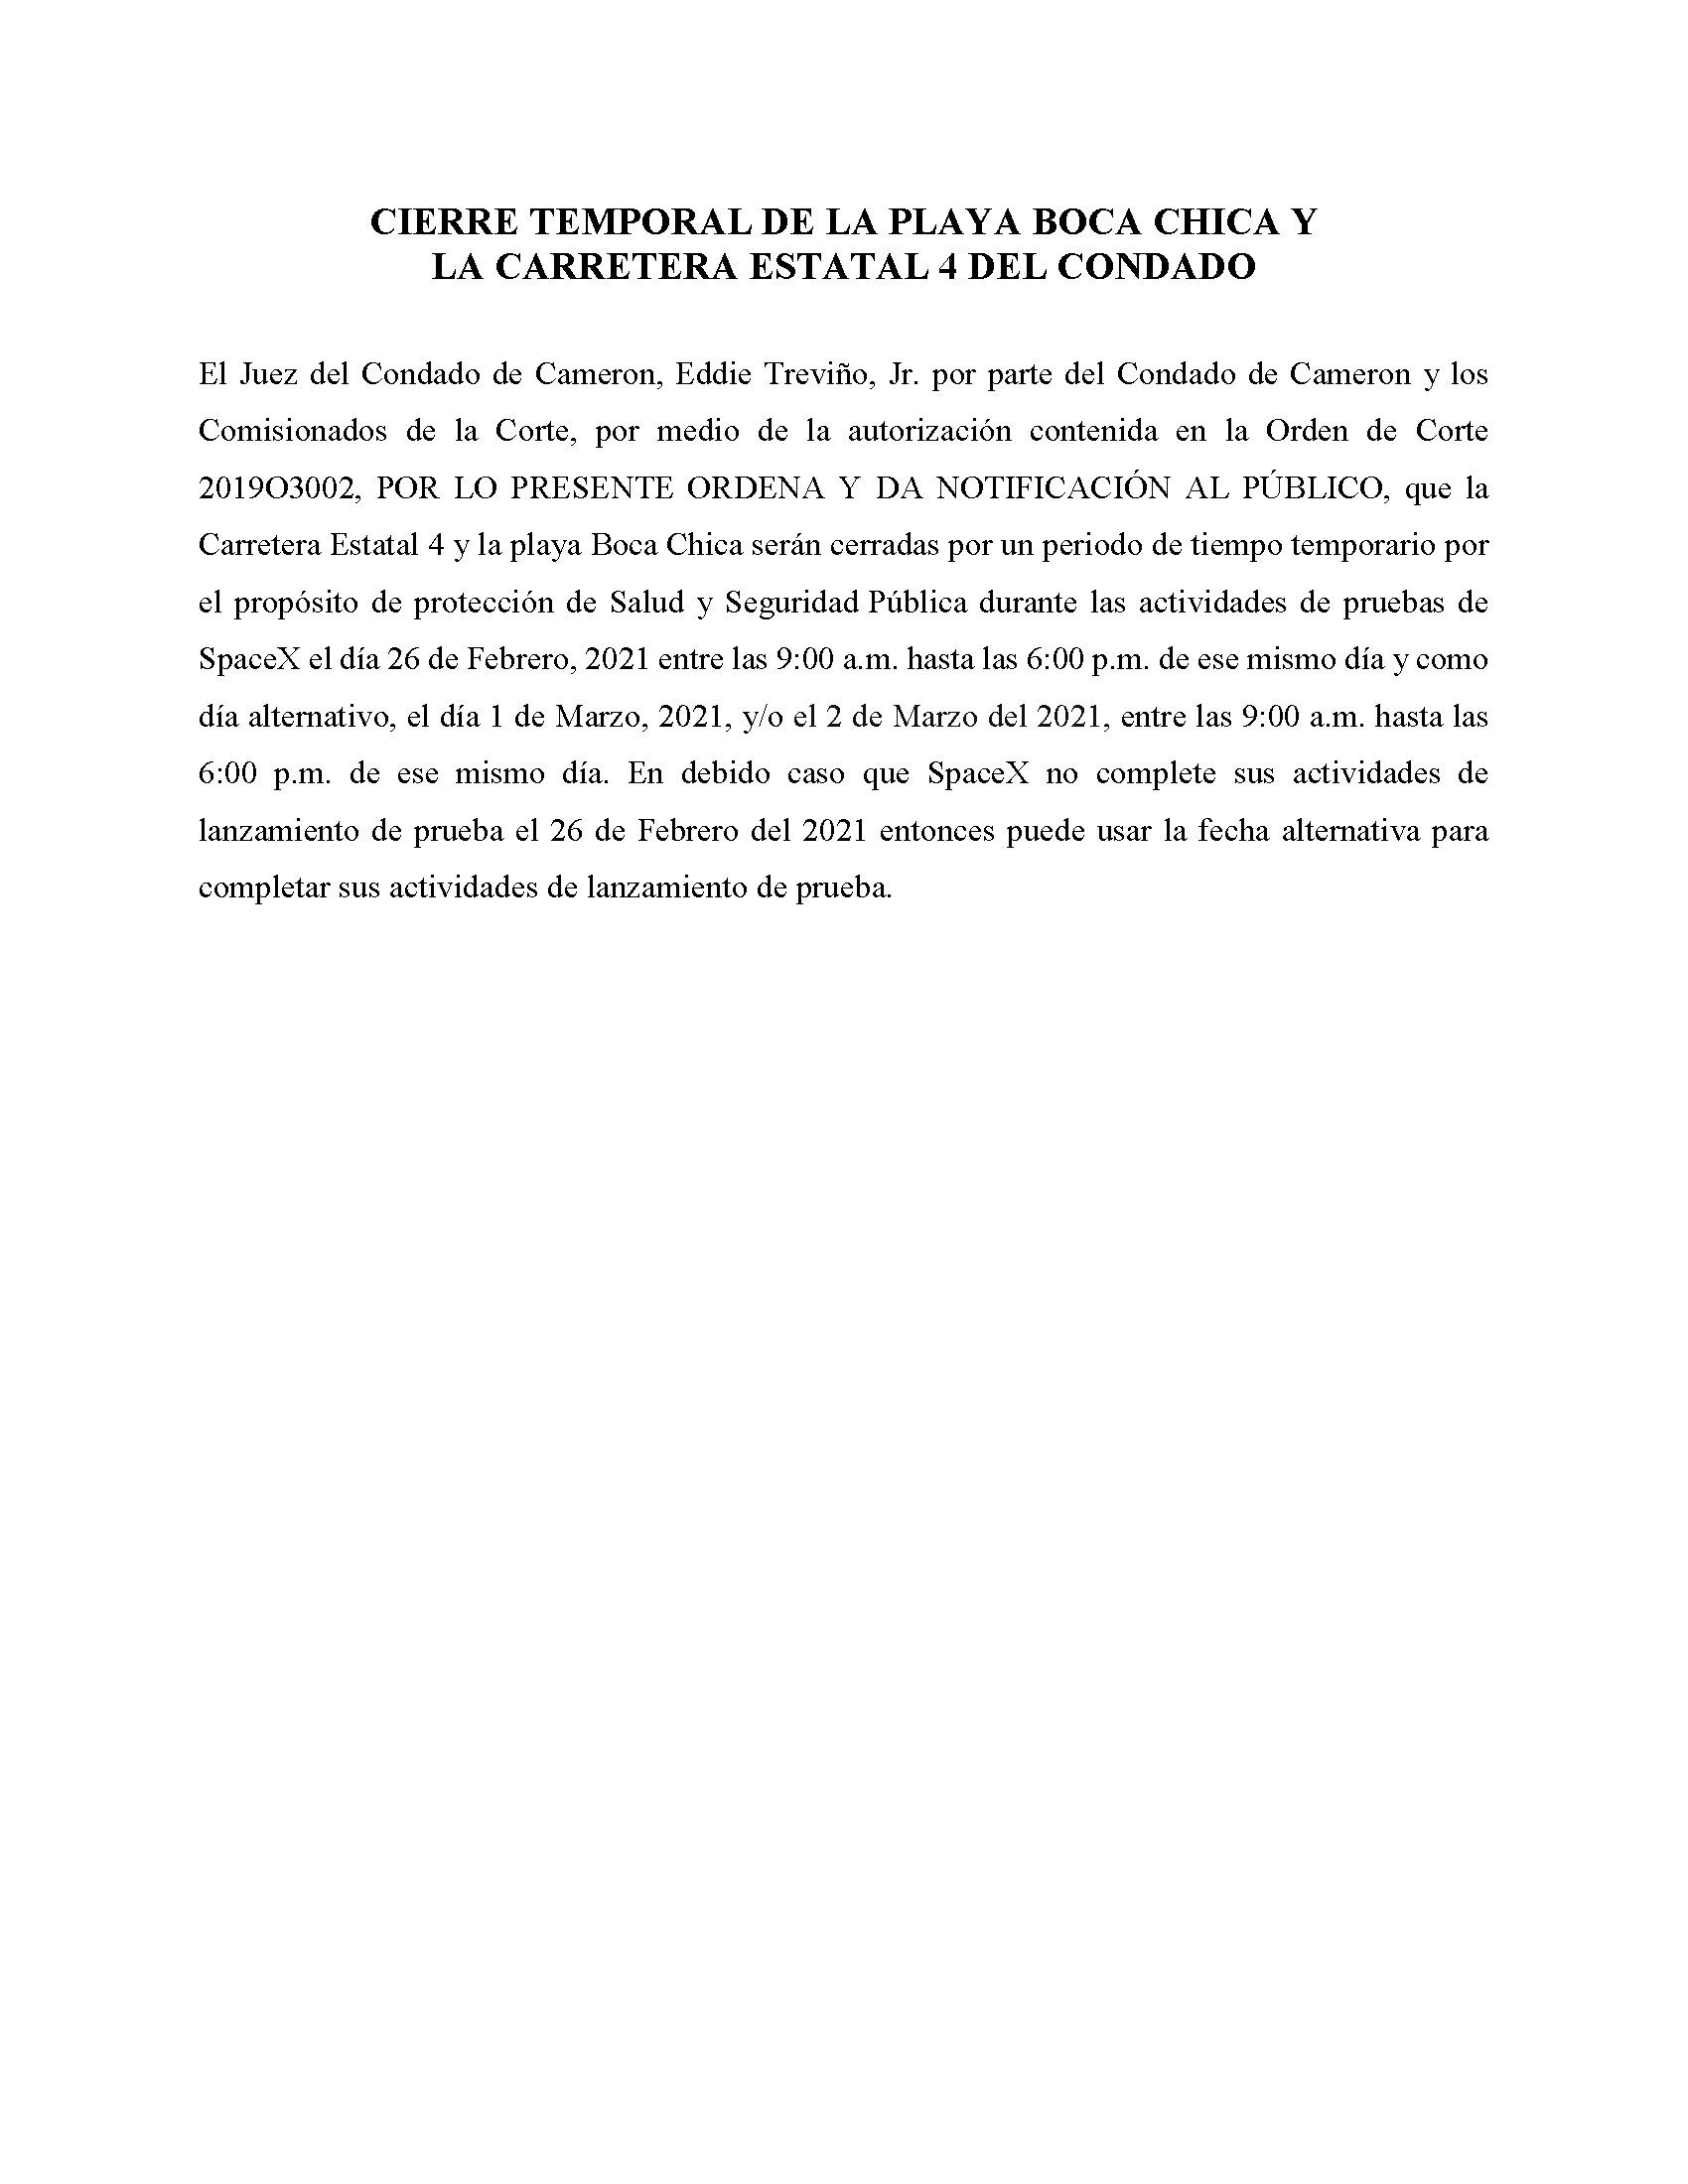 ORDER.CLOSURE OF HIGHWAY 4 Y LA PLAYA BOCA CHICA.SPANISH.02.26.2021